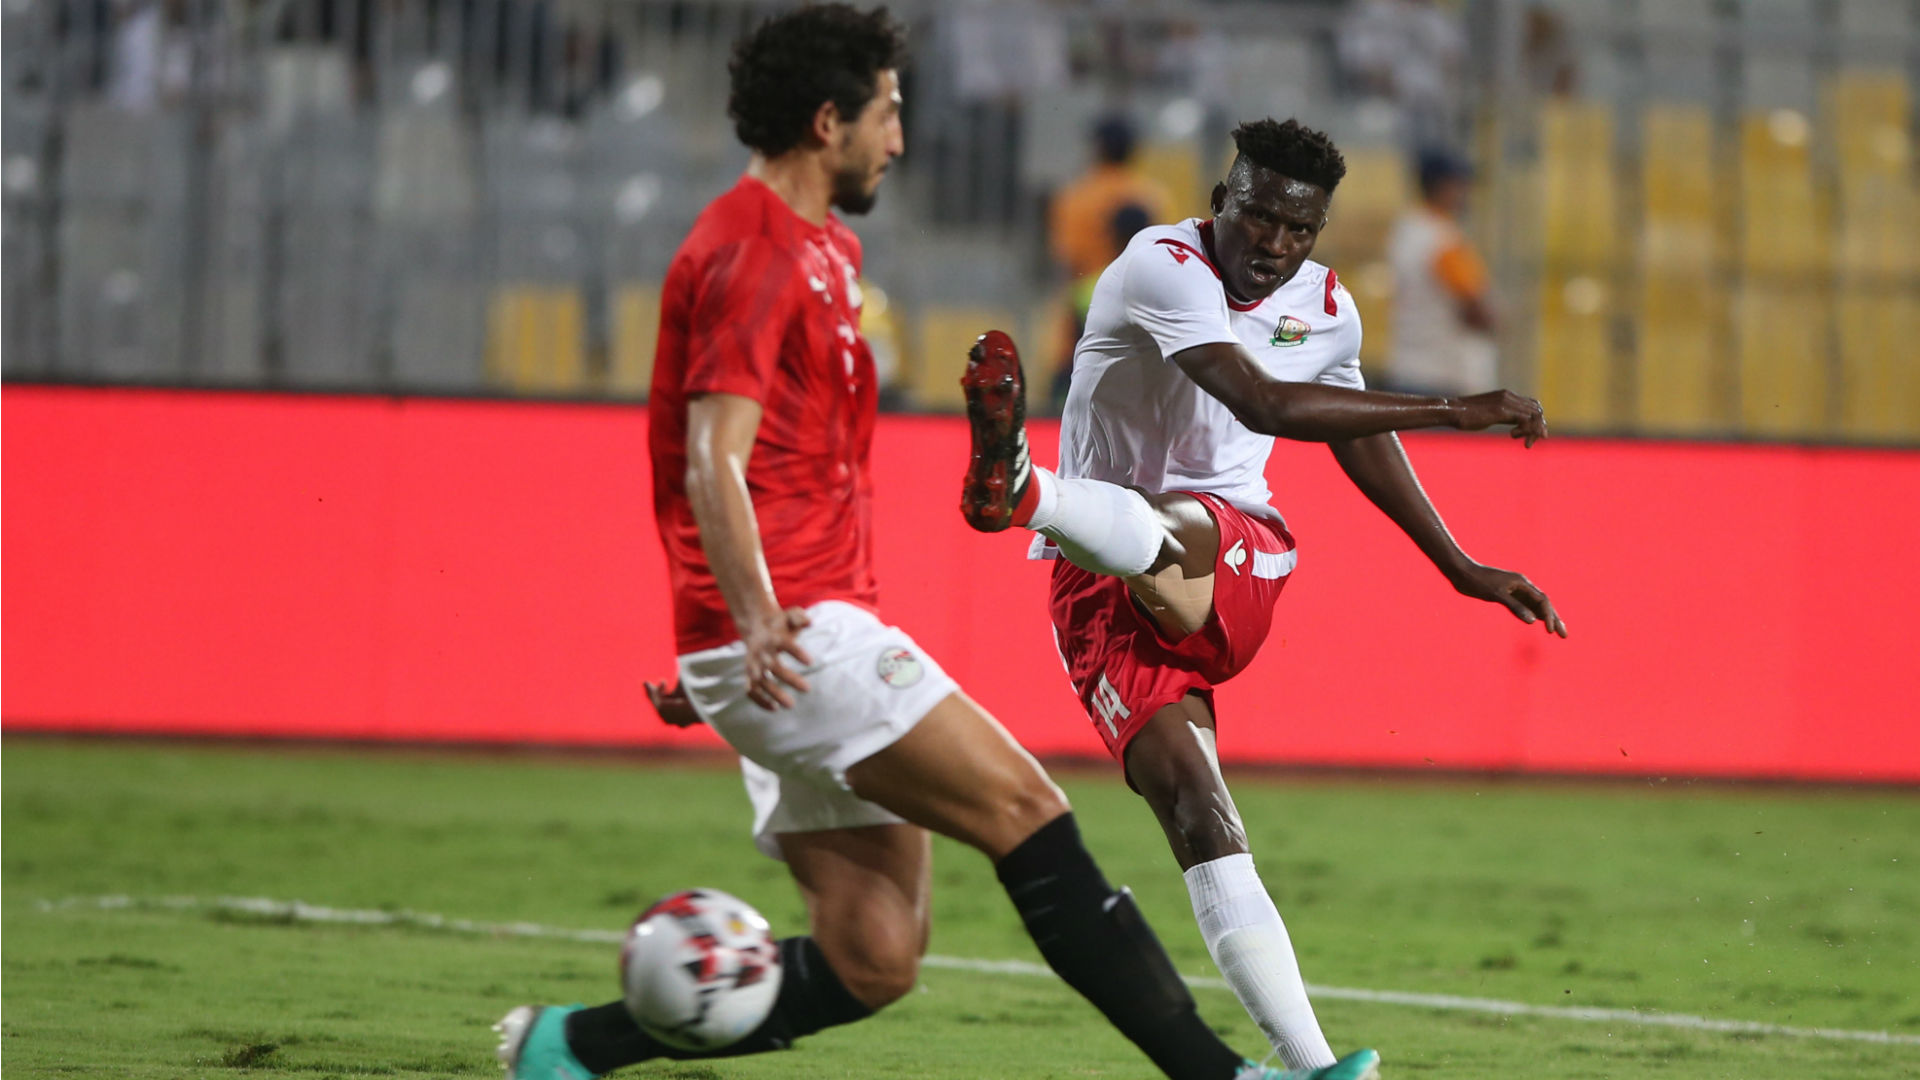 Afcon 2021 Qualifier: Egypt 1-1 Kenya - Michael Olunga strike denies the hosts